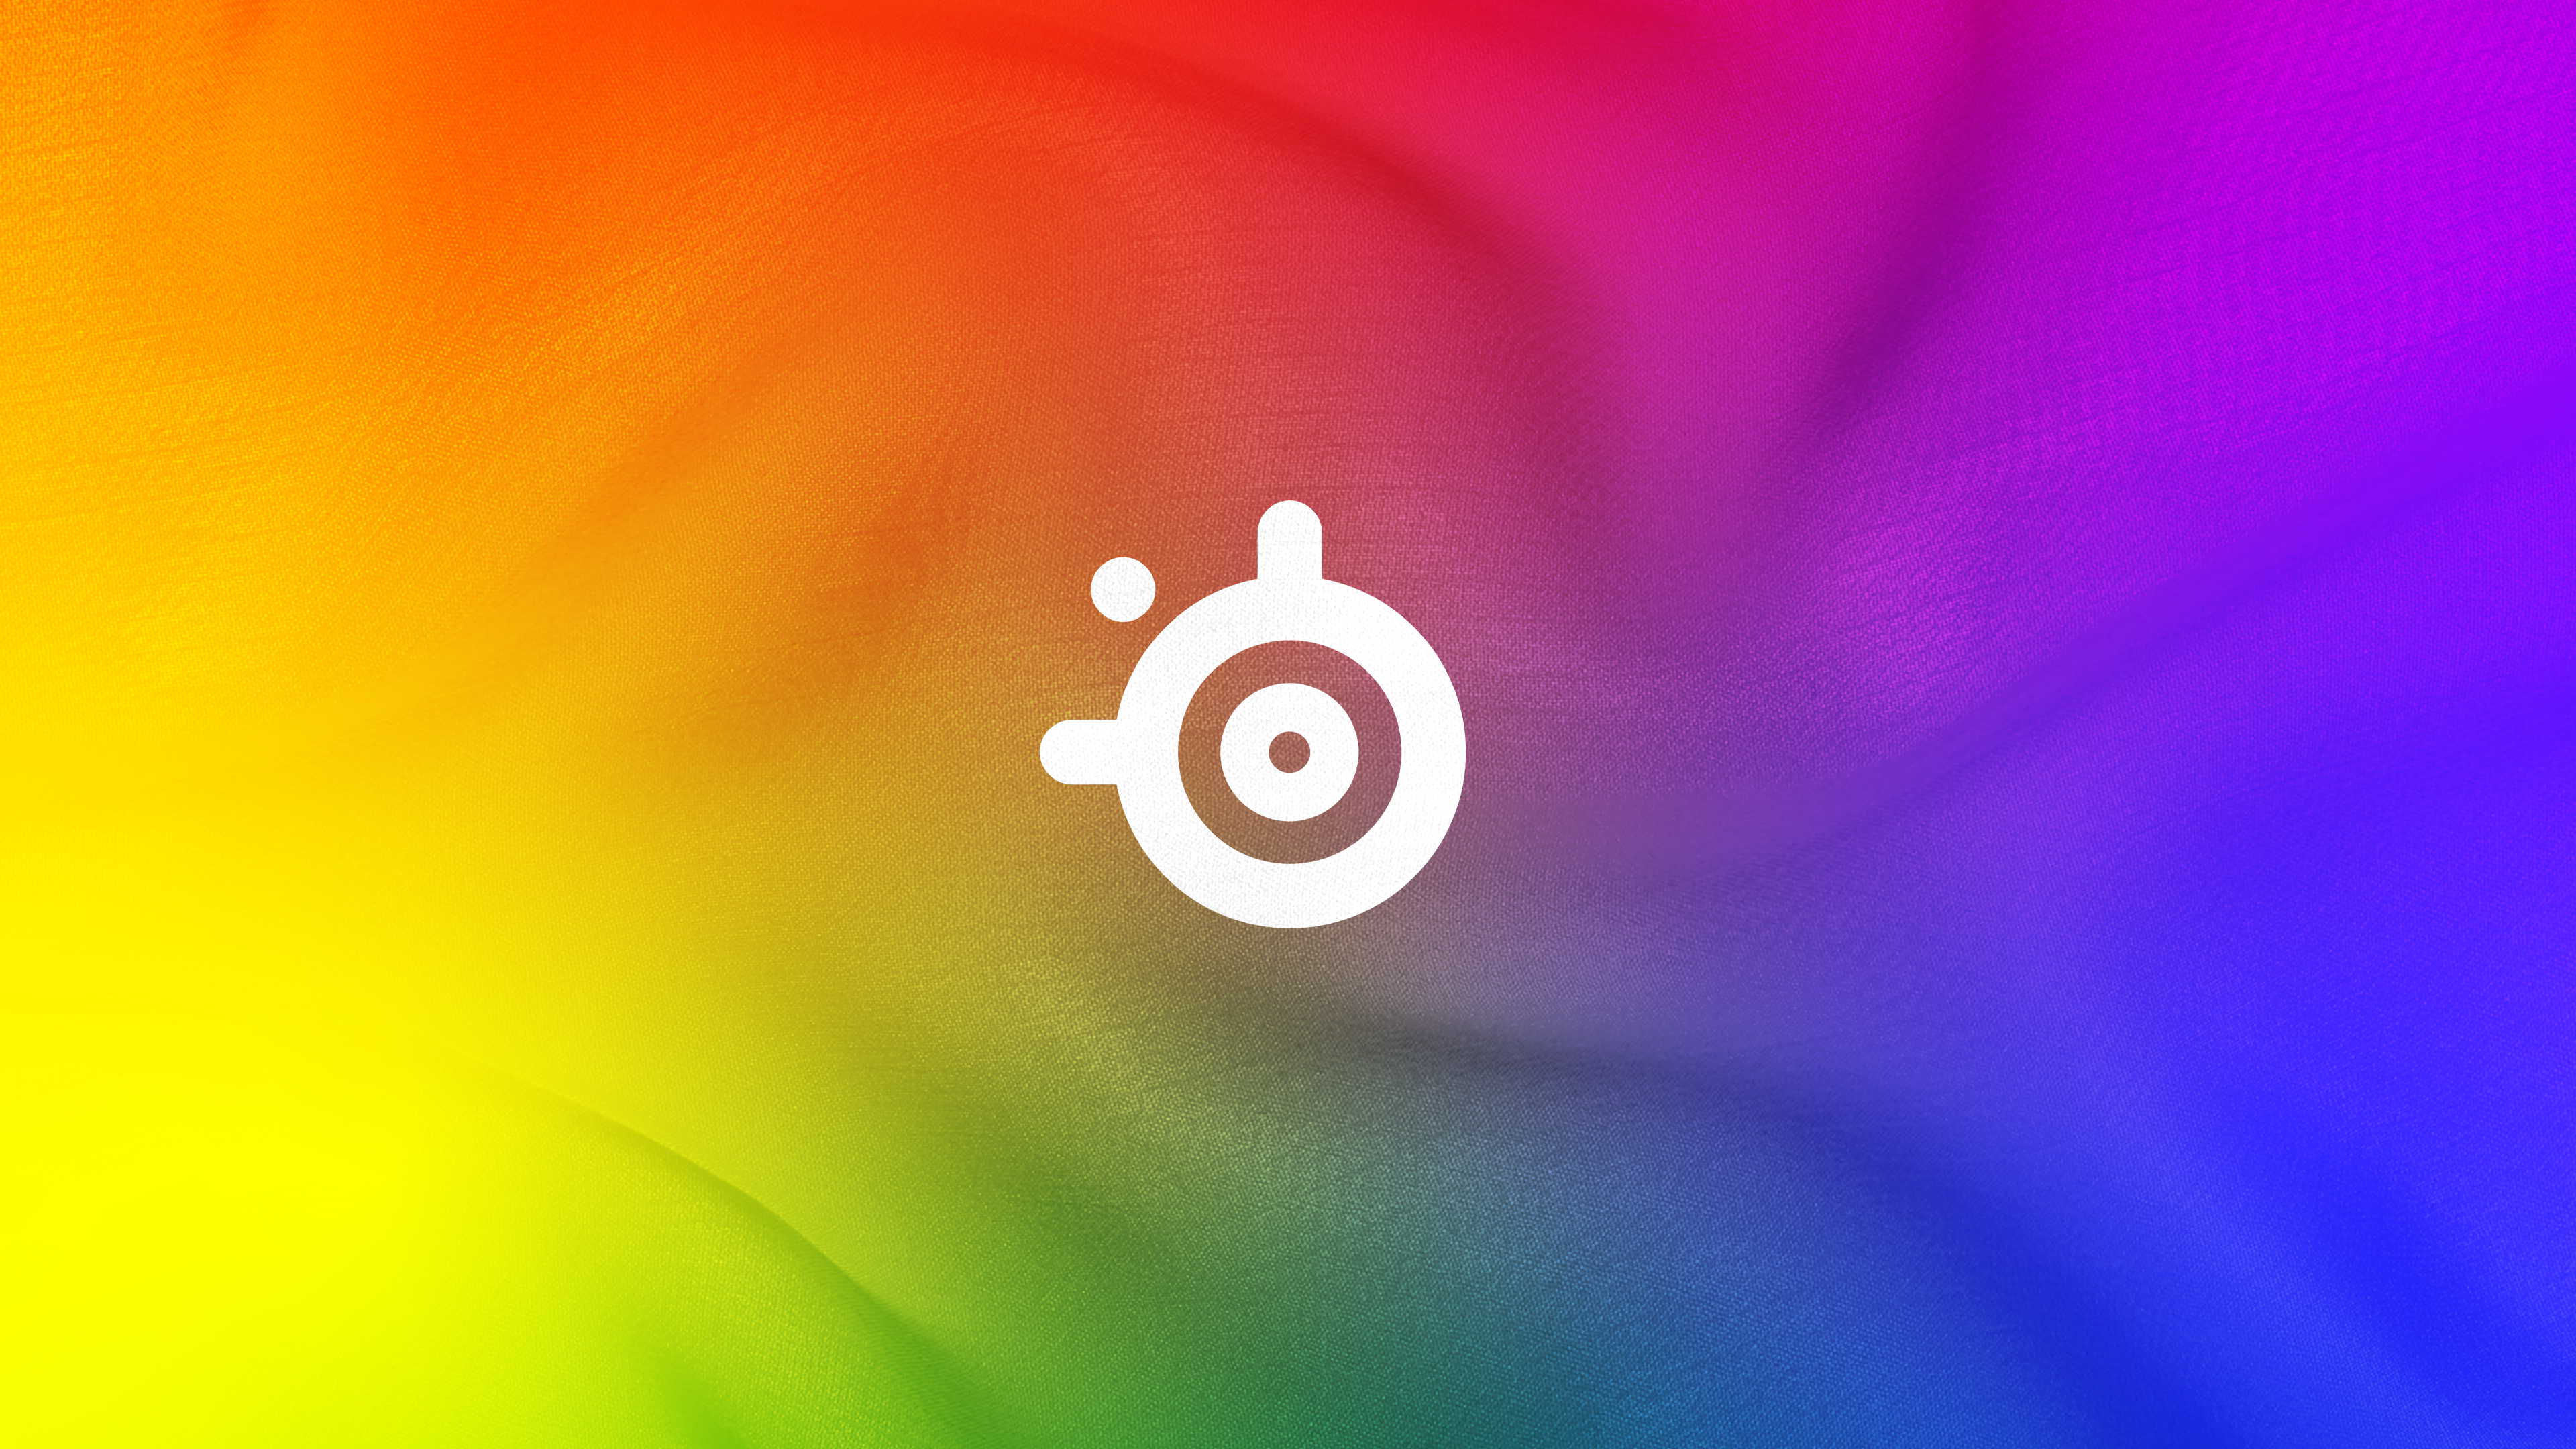 SteelSeries logo on a rainbow background